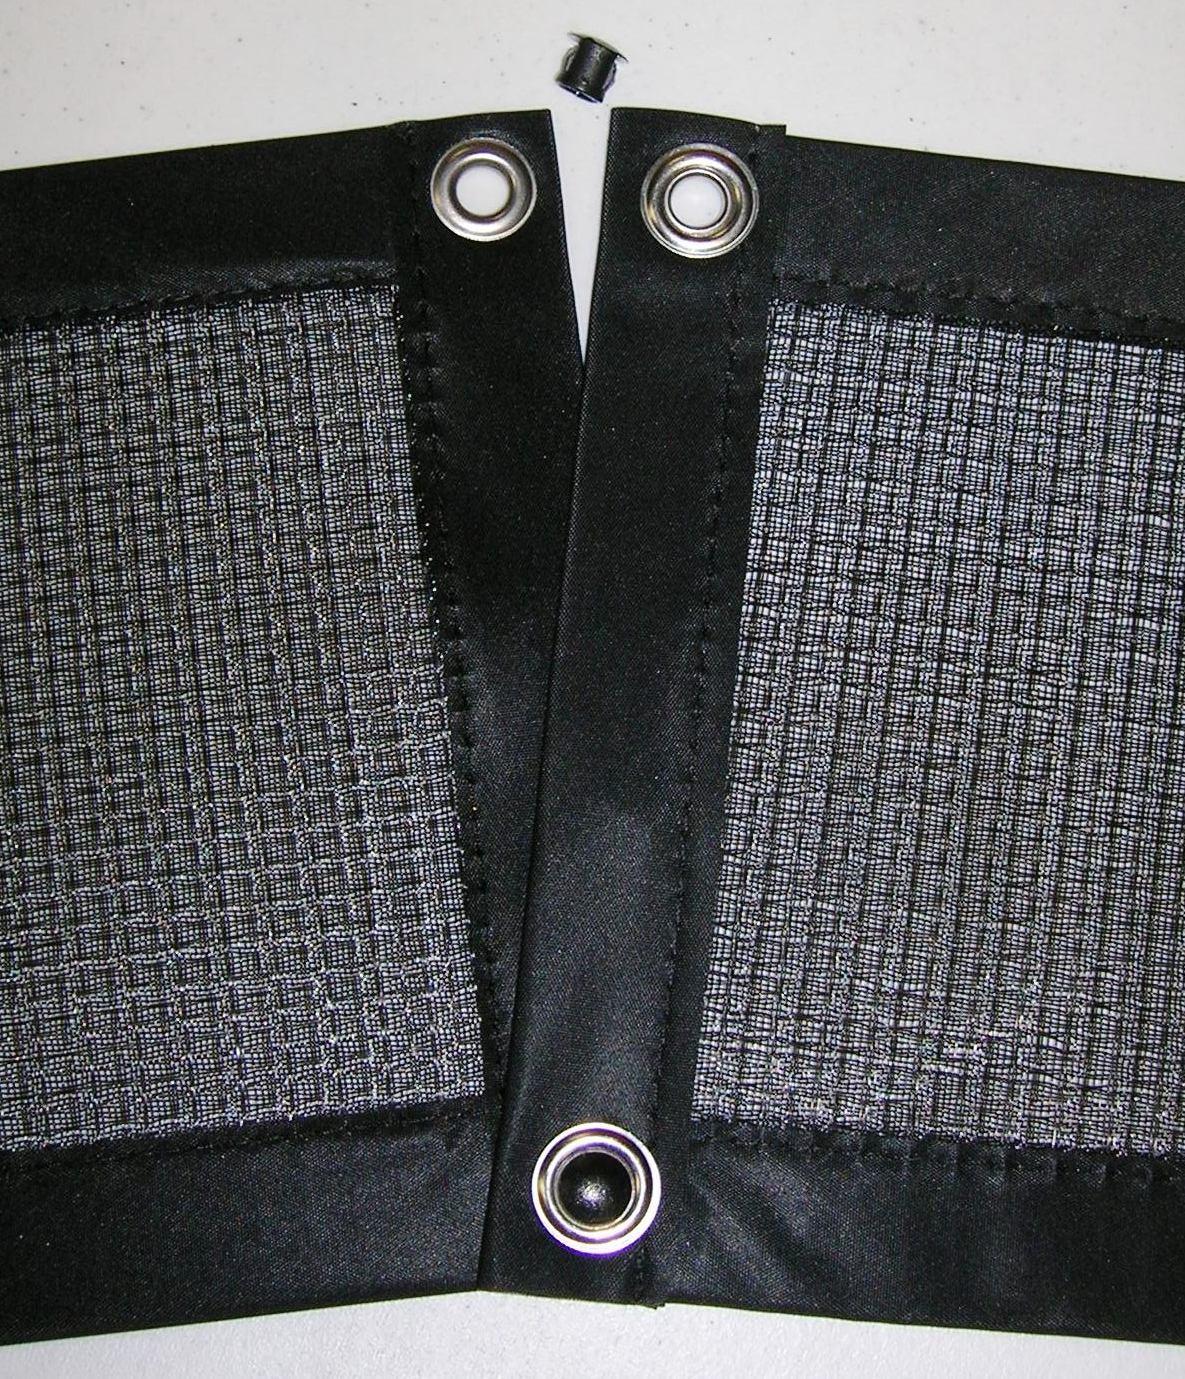 permatron-filter-screen-snap-connection